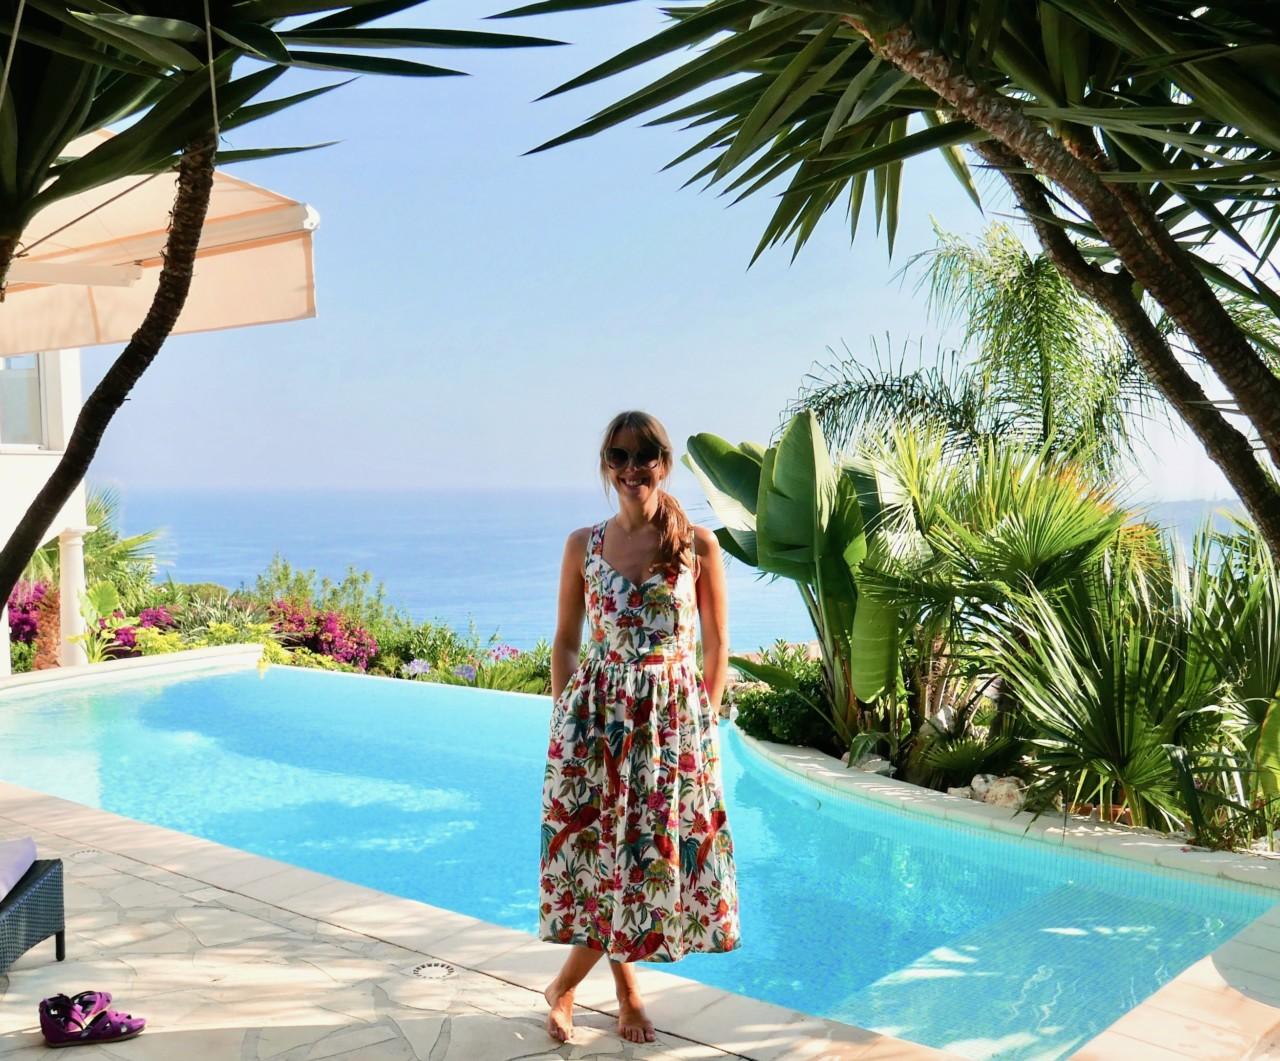 sundress-vintage-menton-cote-azur-pool-anja-stang